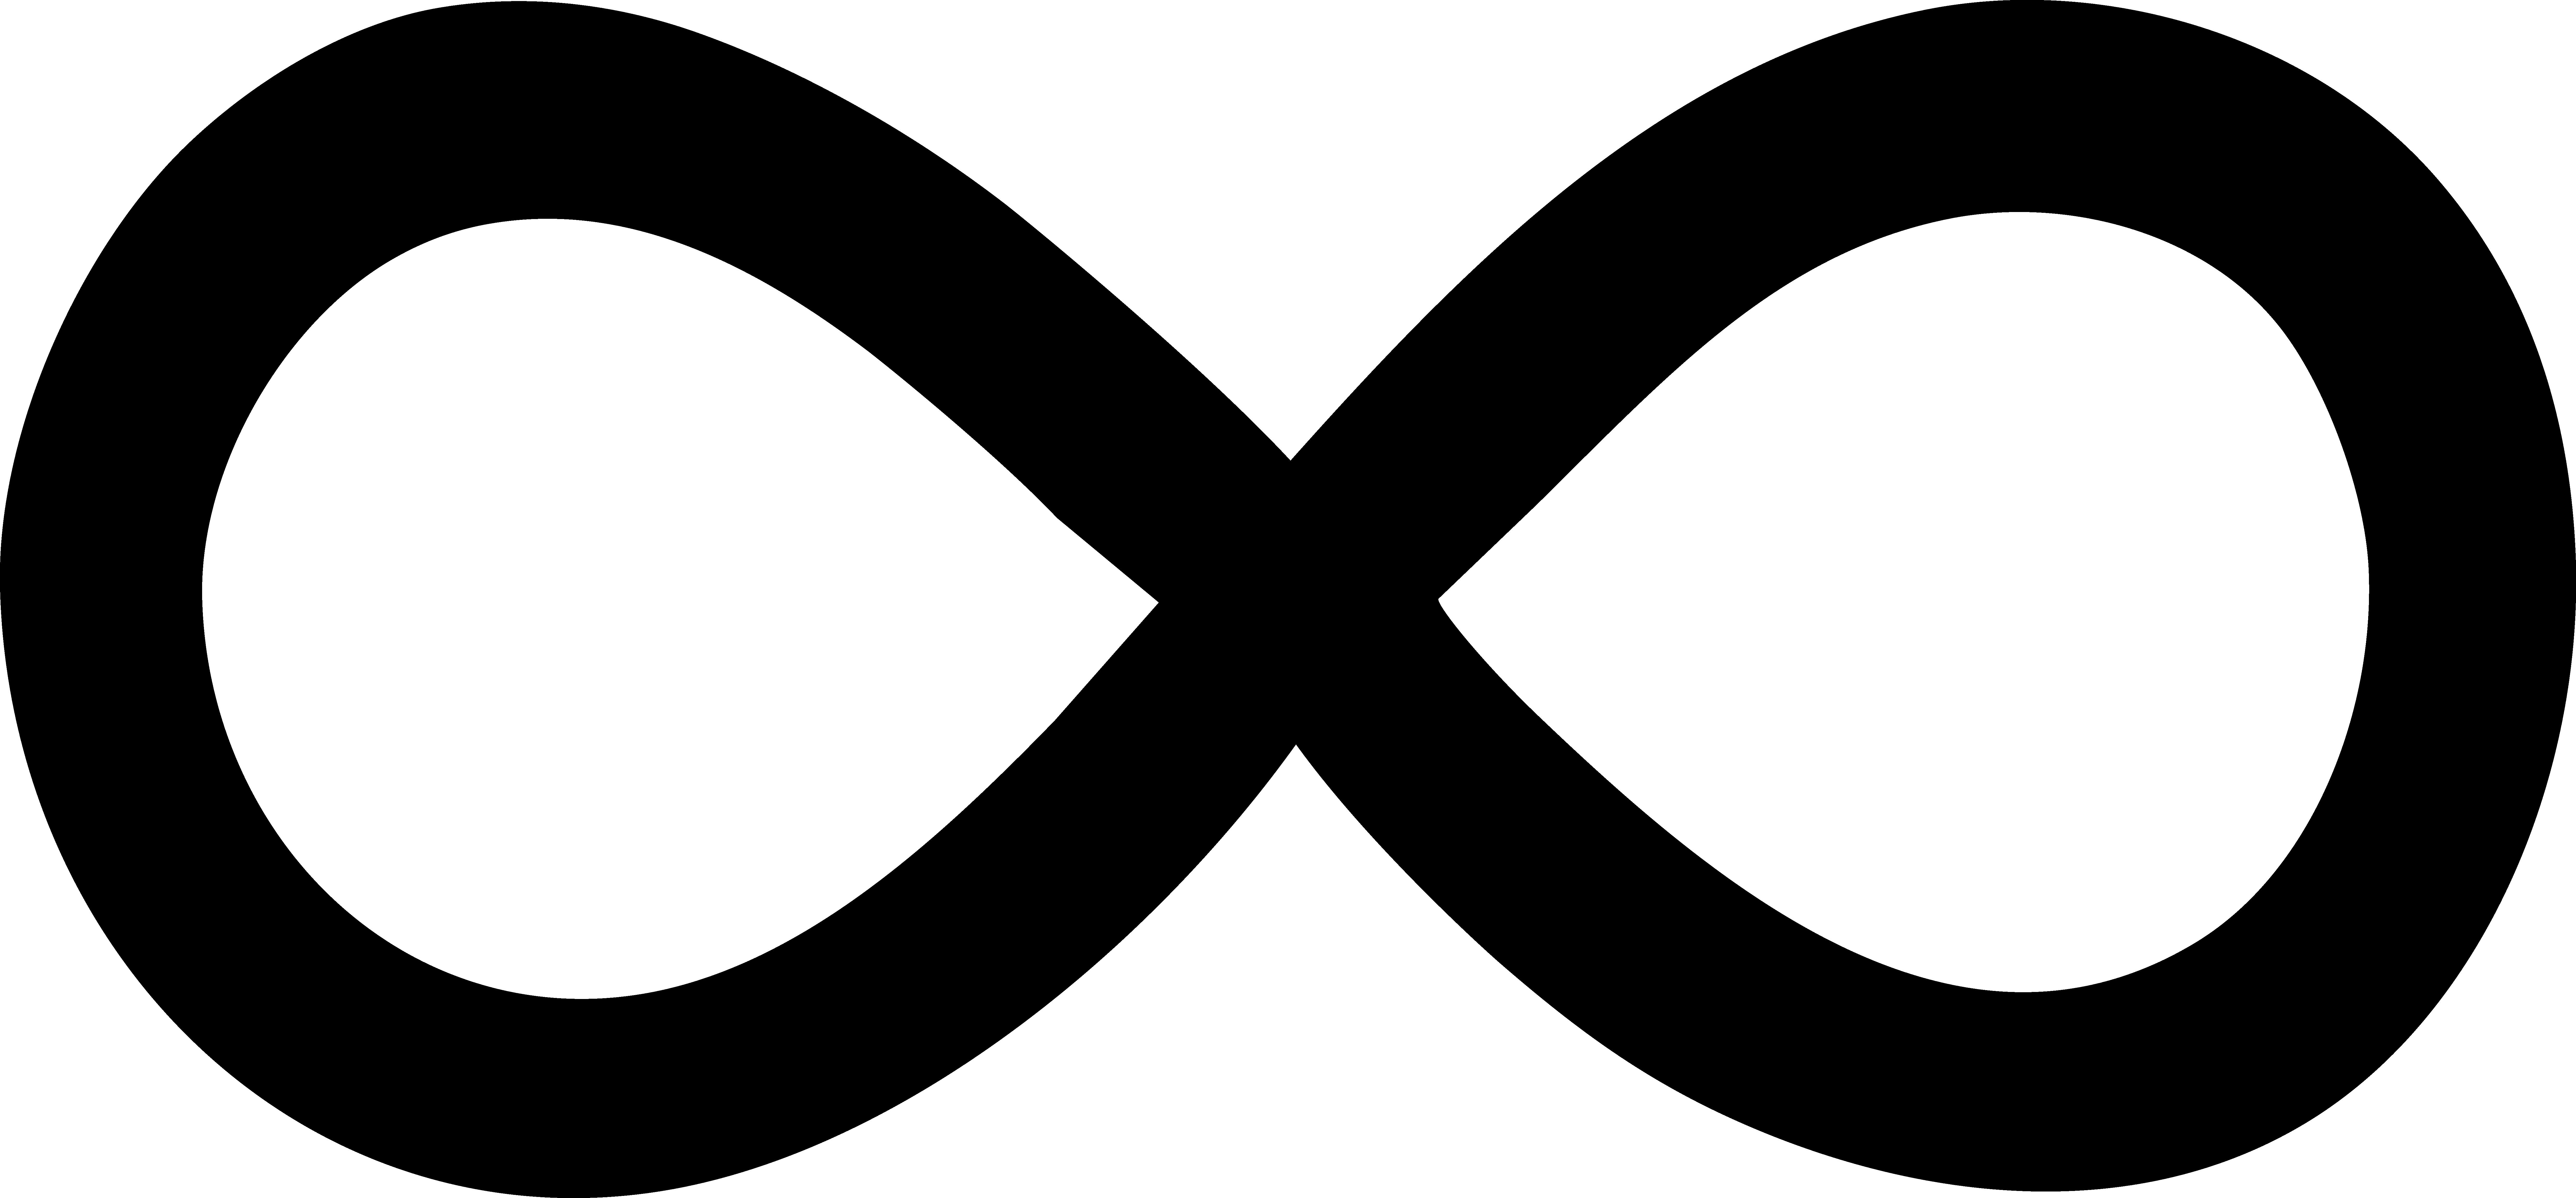 9903x4605 Simple Black Infinity Symbol